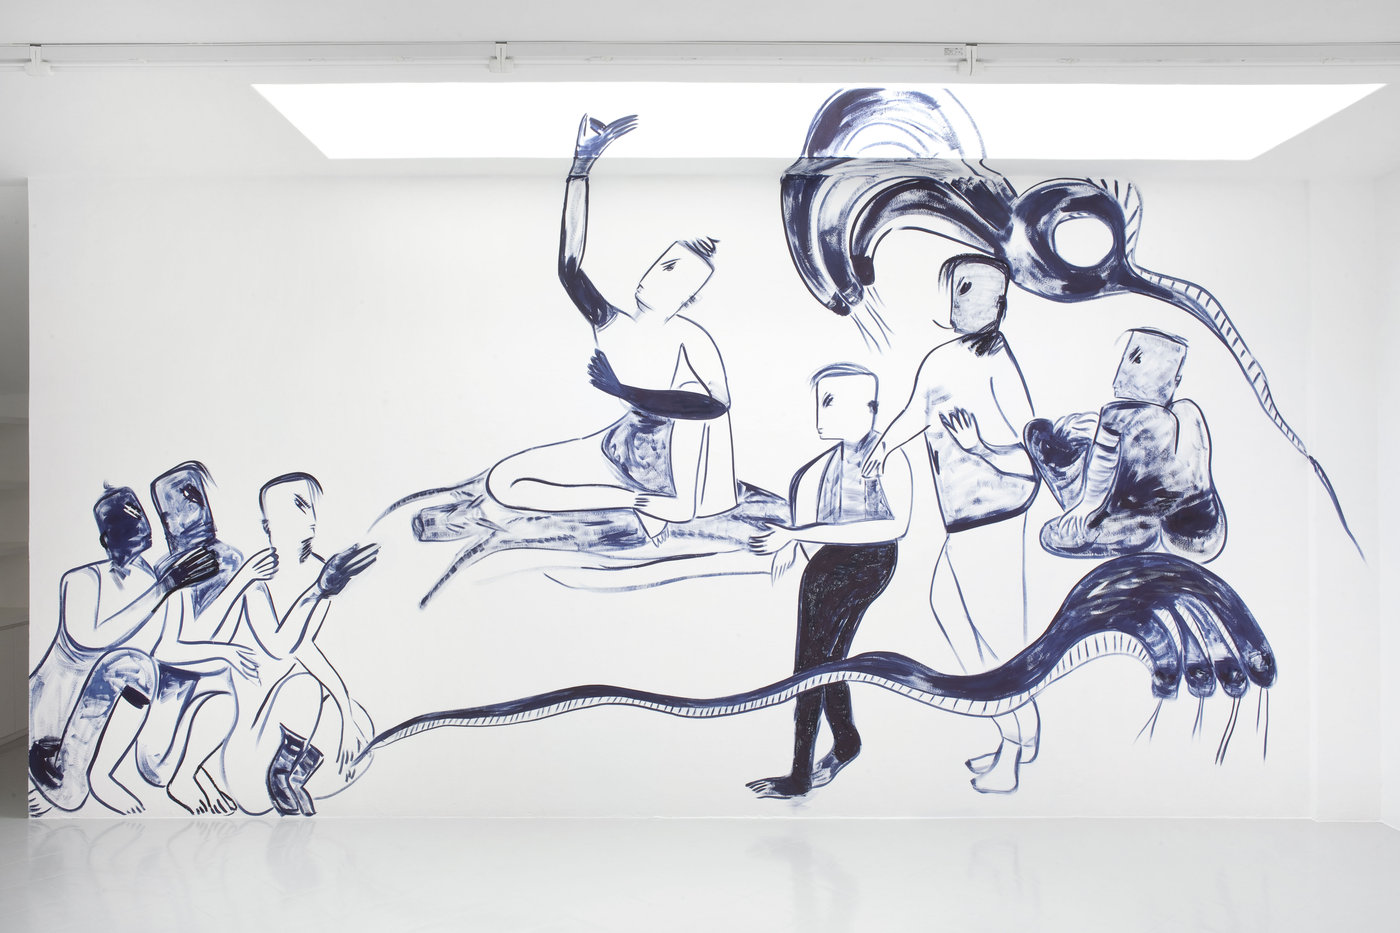 2 - Melike Kara, SAVANNAHS, GRASSLANDS AND DESERTS, 2016, oil stick and ink on wall, 600x300 cm - Courtesy Studiolo, Milan